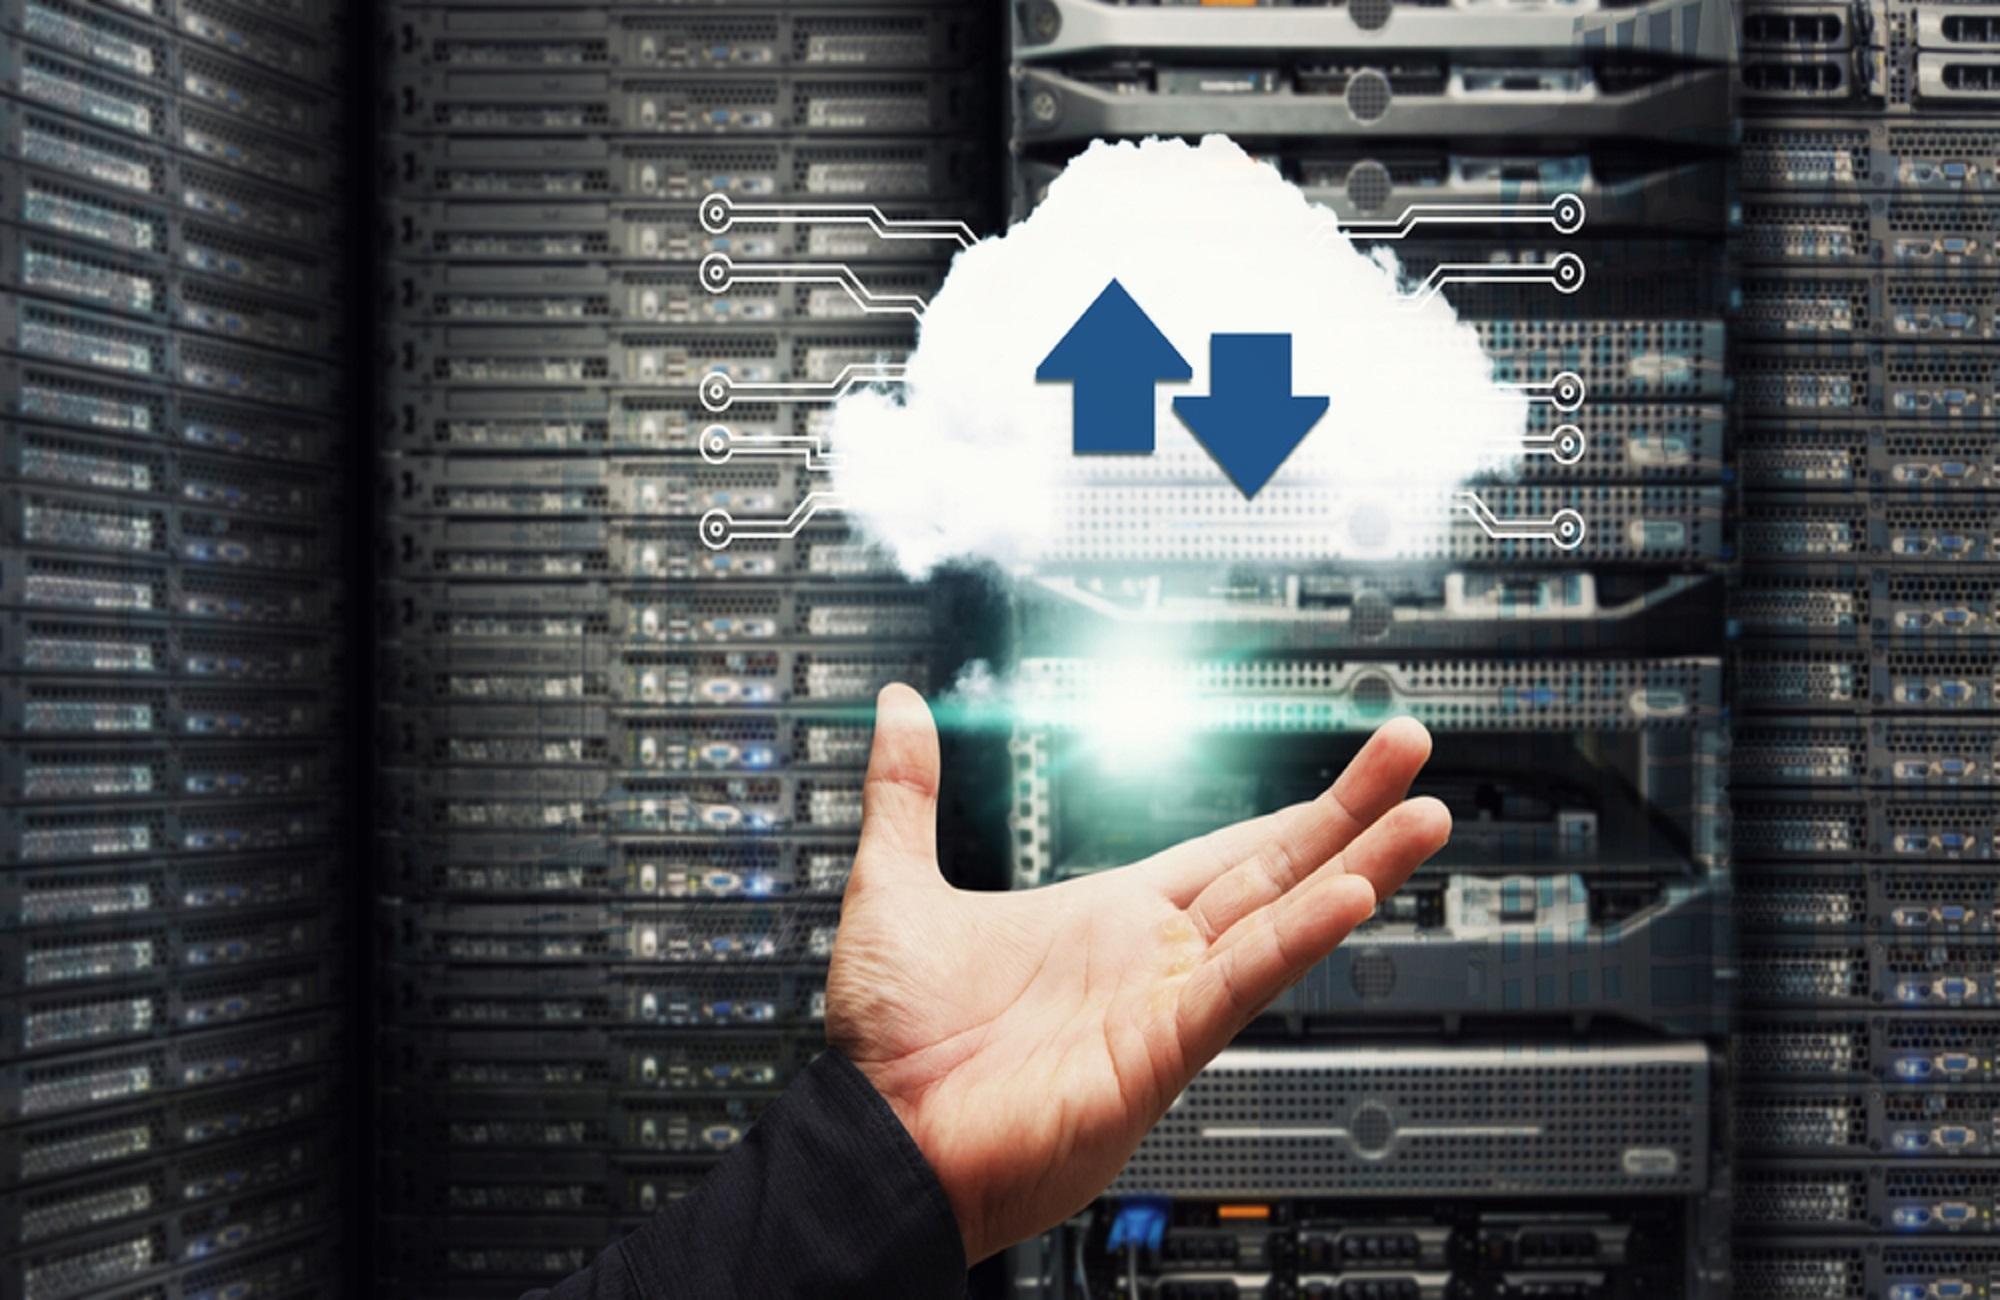 Main visual : The false dichotomy of cloud and mainframes